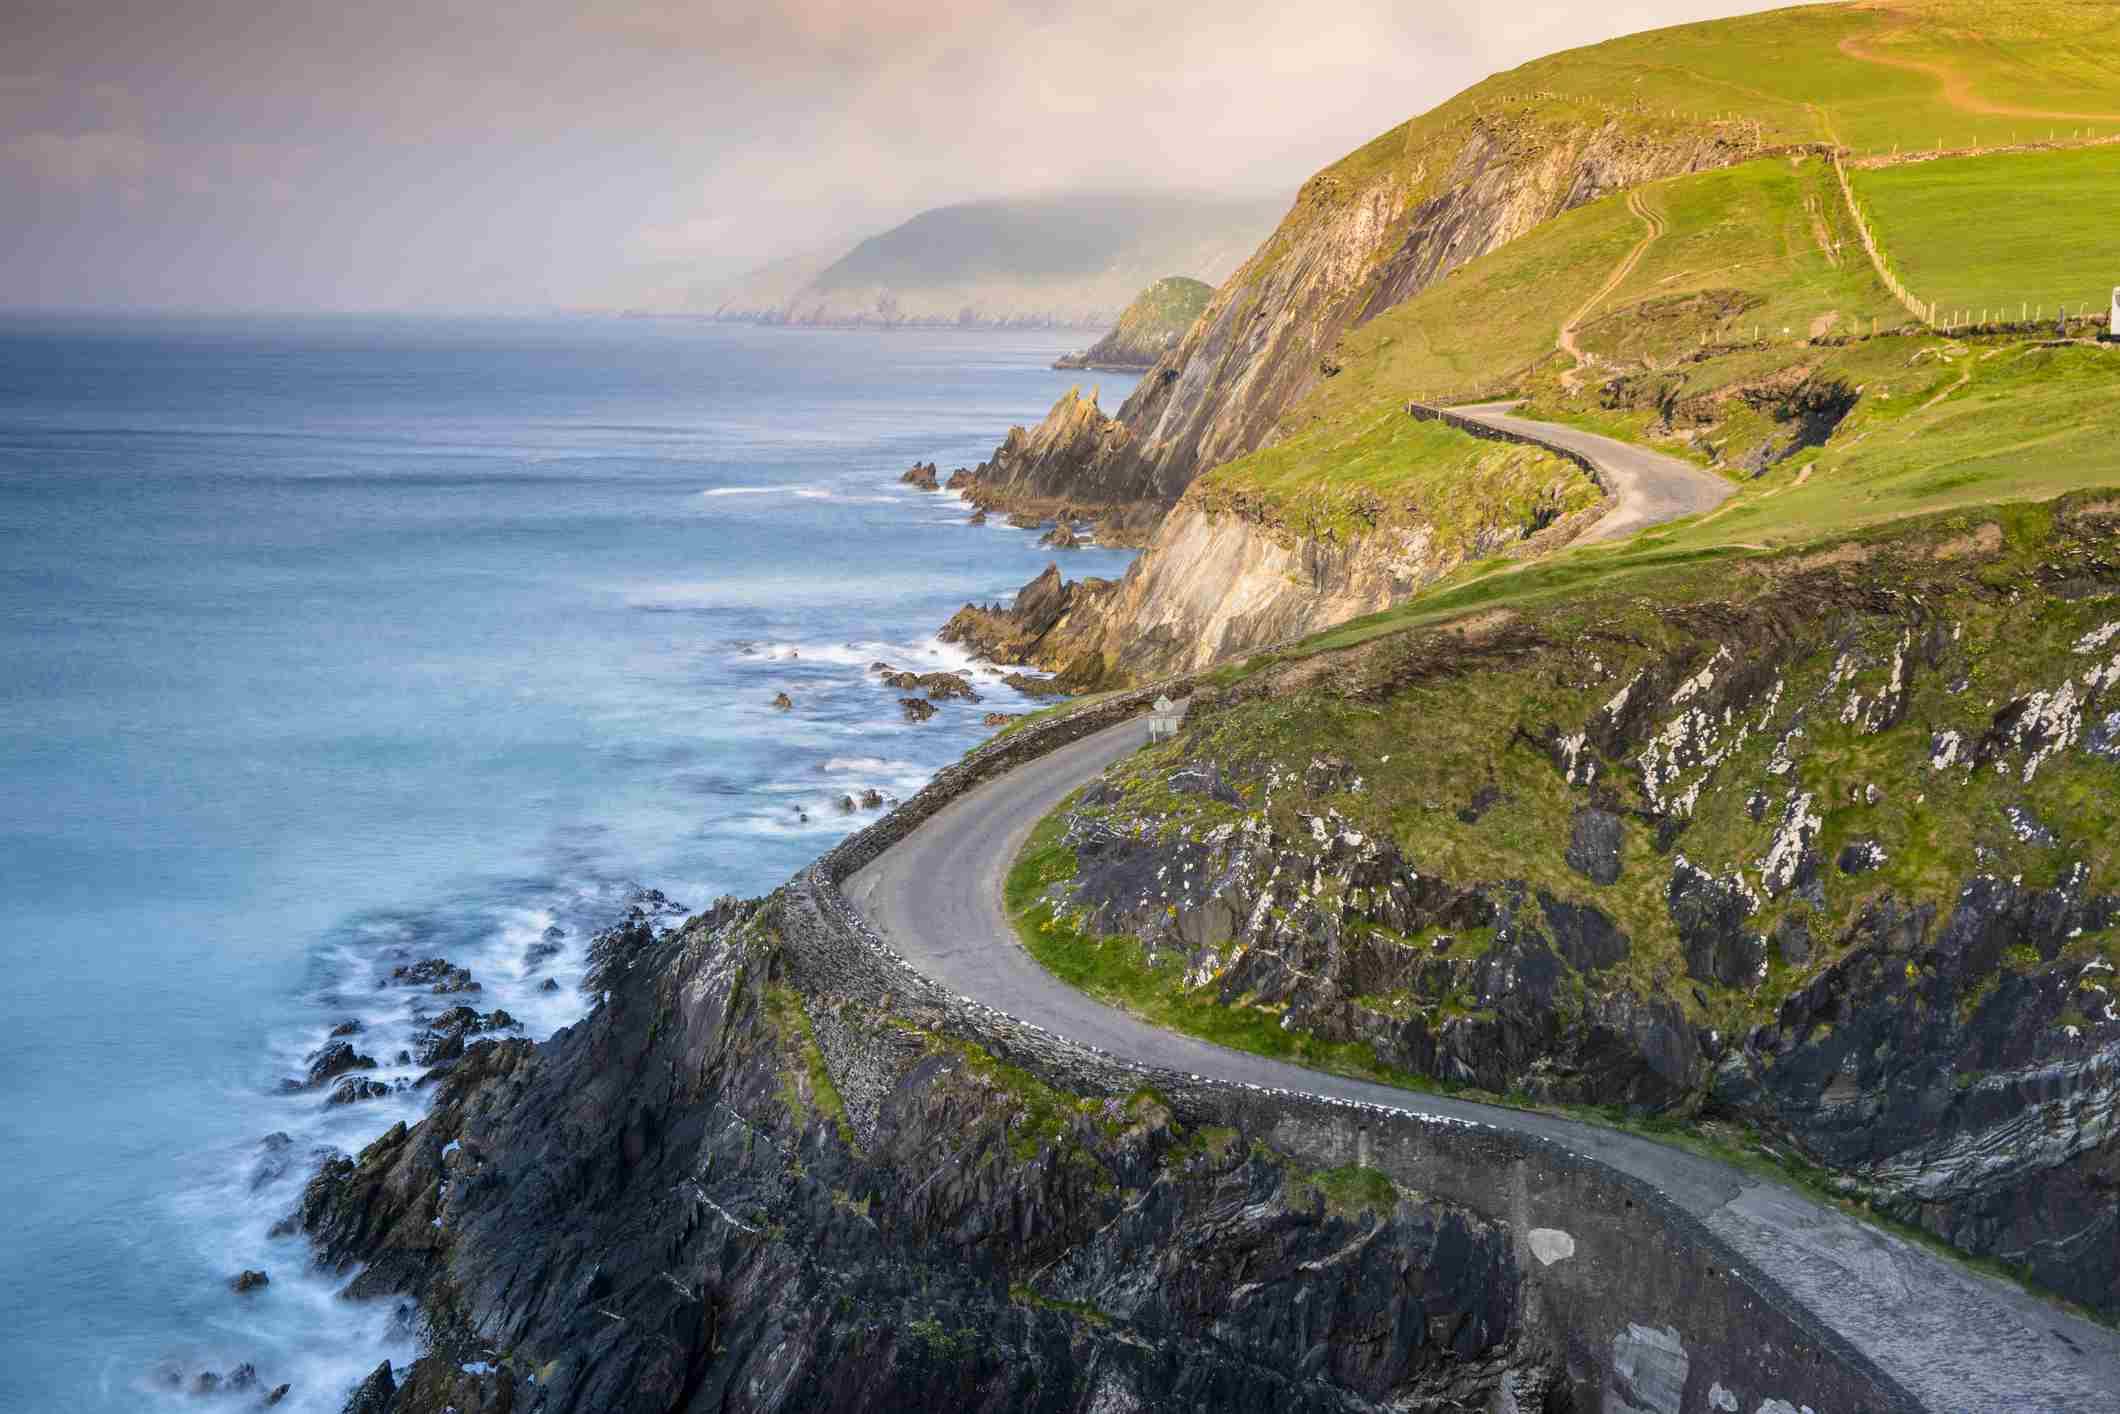 Coumeenoole beach (Slea Head), Dingle peninsula, County Kerry, Munster province, Ireland, Europe.